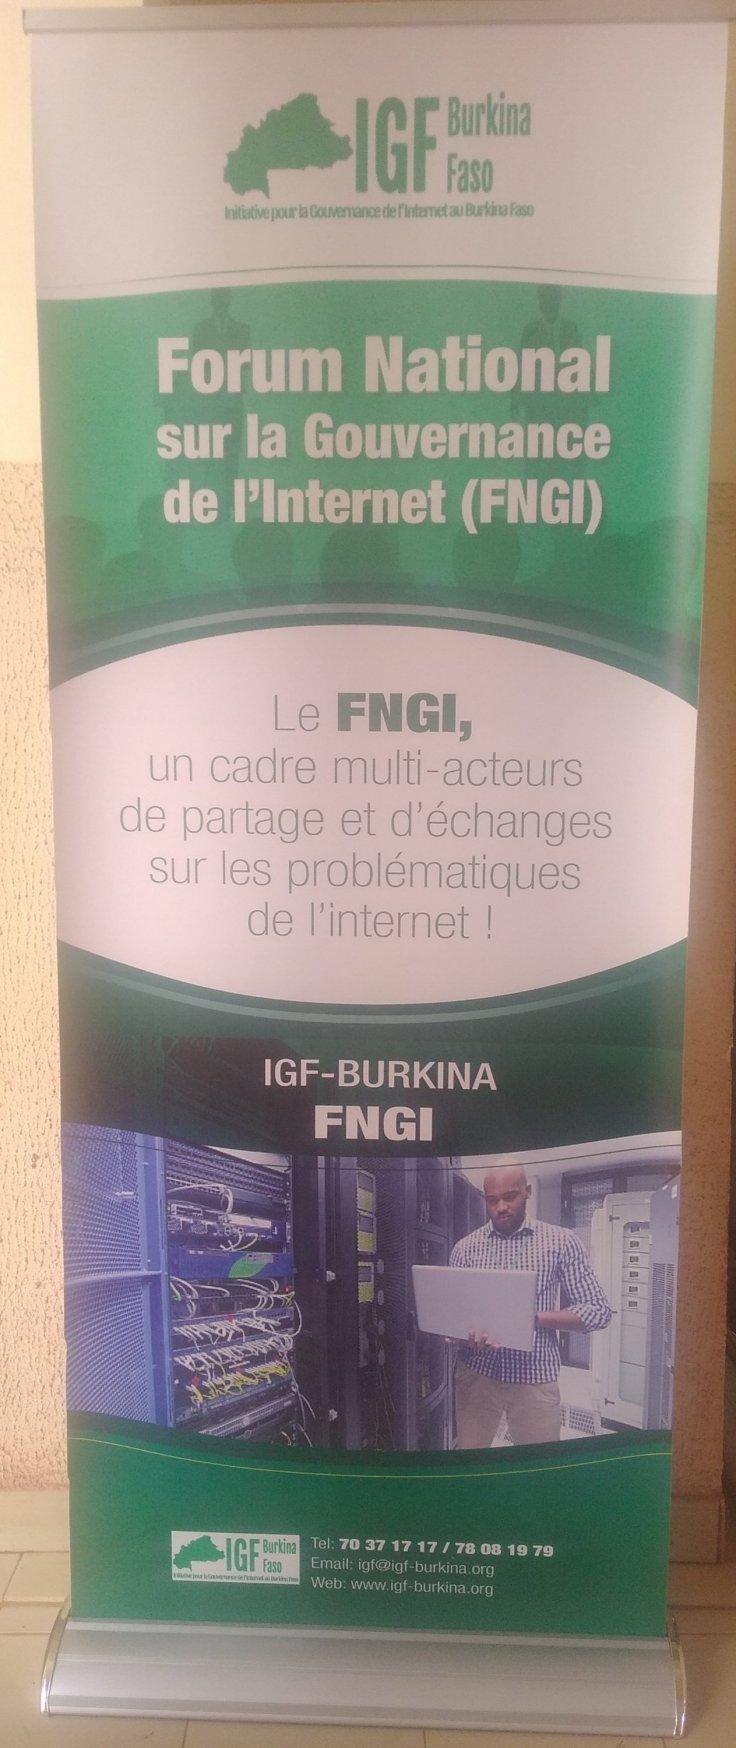 IGF-Burkina http://www.igf-burkina.org/about.php .jpg